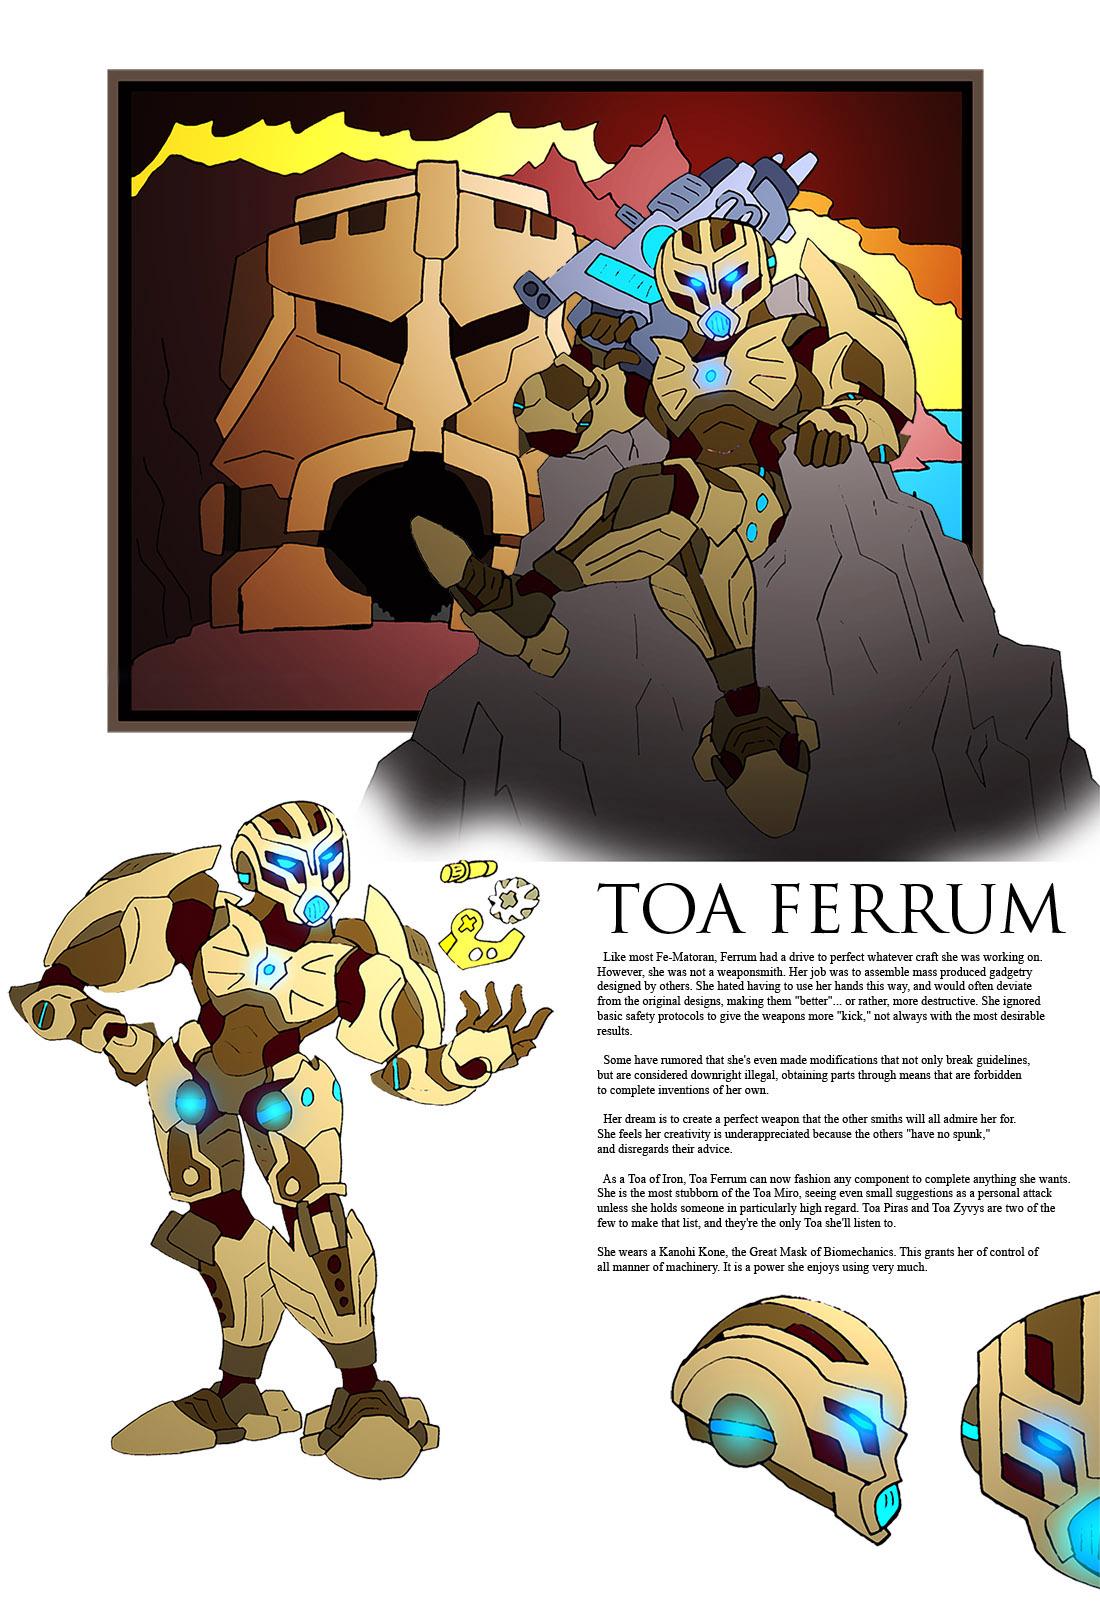 toa_ferrum_bio_by_nickinamerica-d7d69g8.